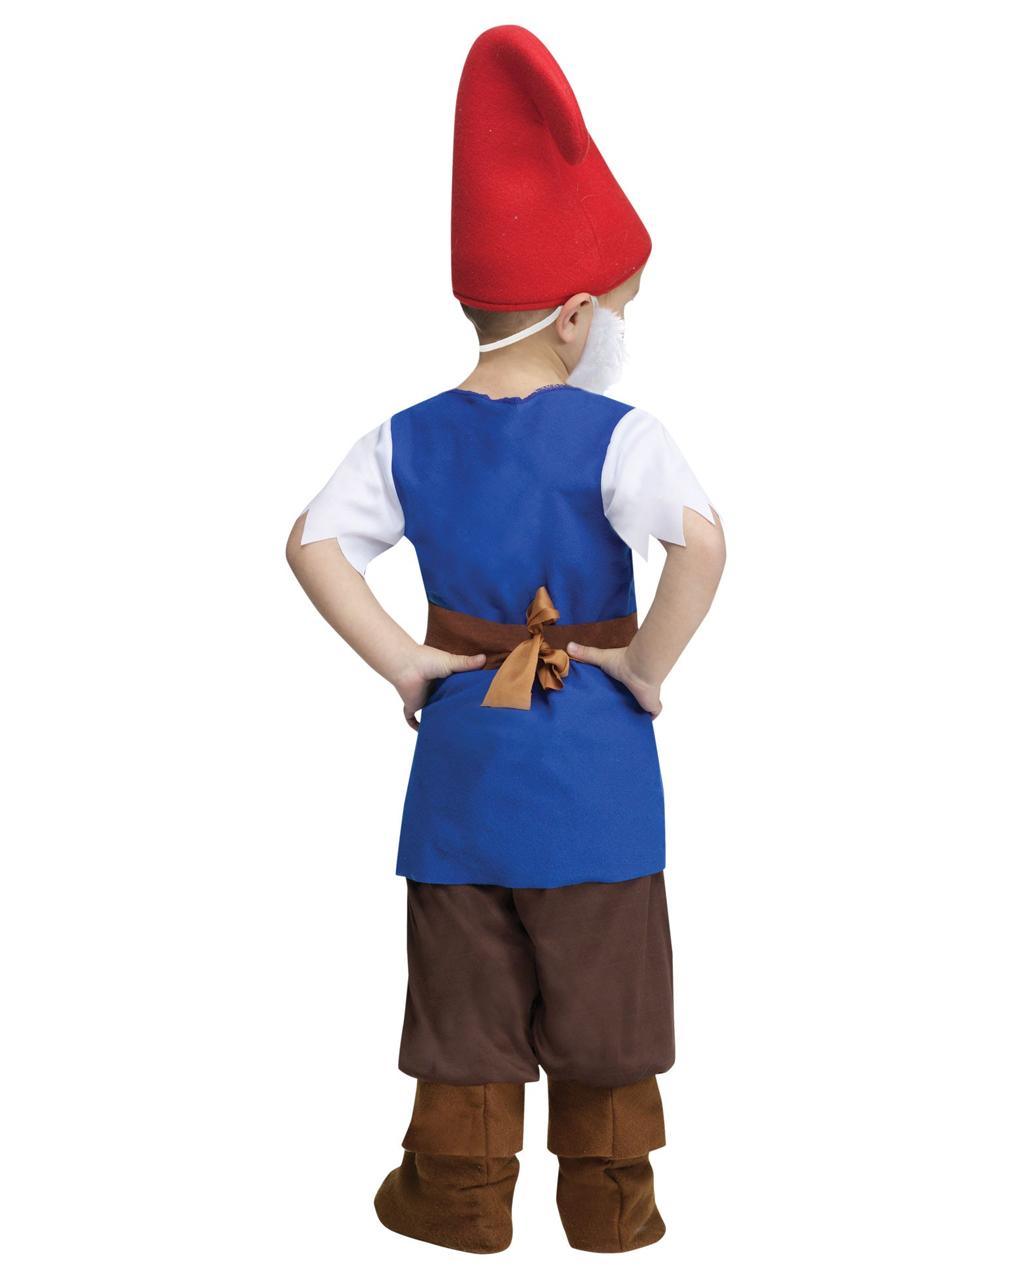 mr gnome kinderkost m l s es zergenkost m f r den. Black Bedroom Furniture Sets. Home Design Ideas